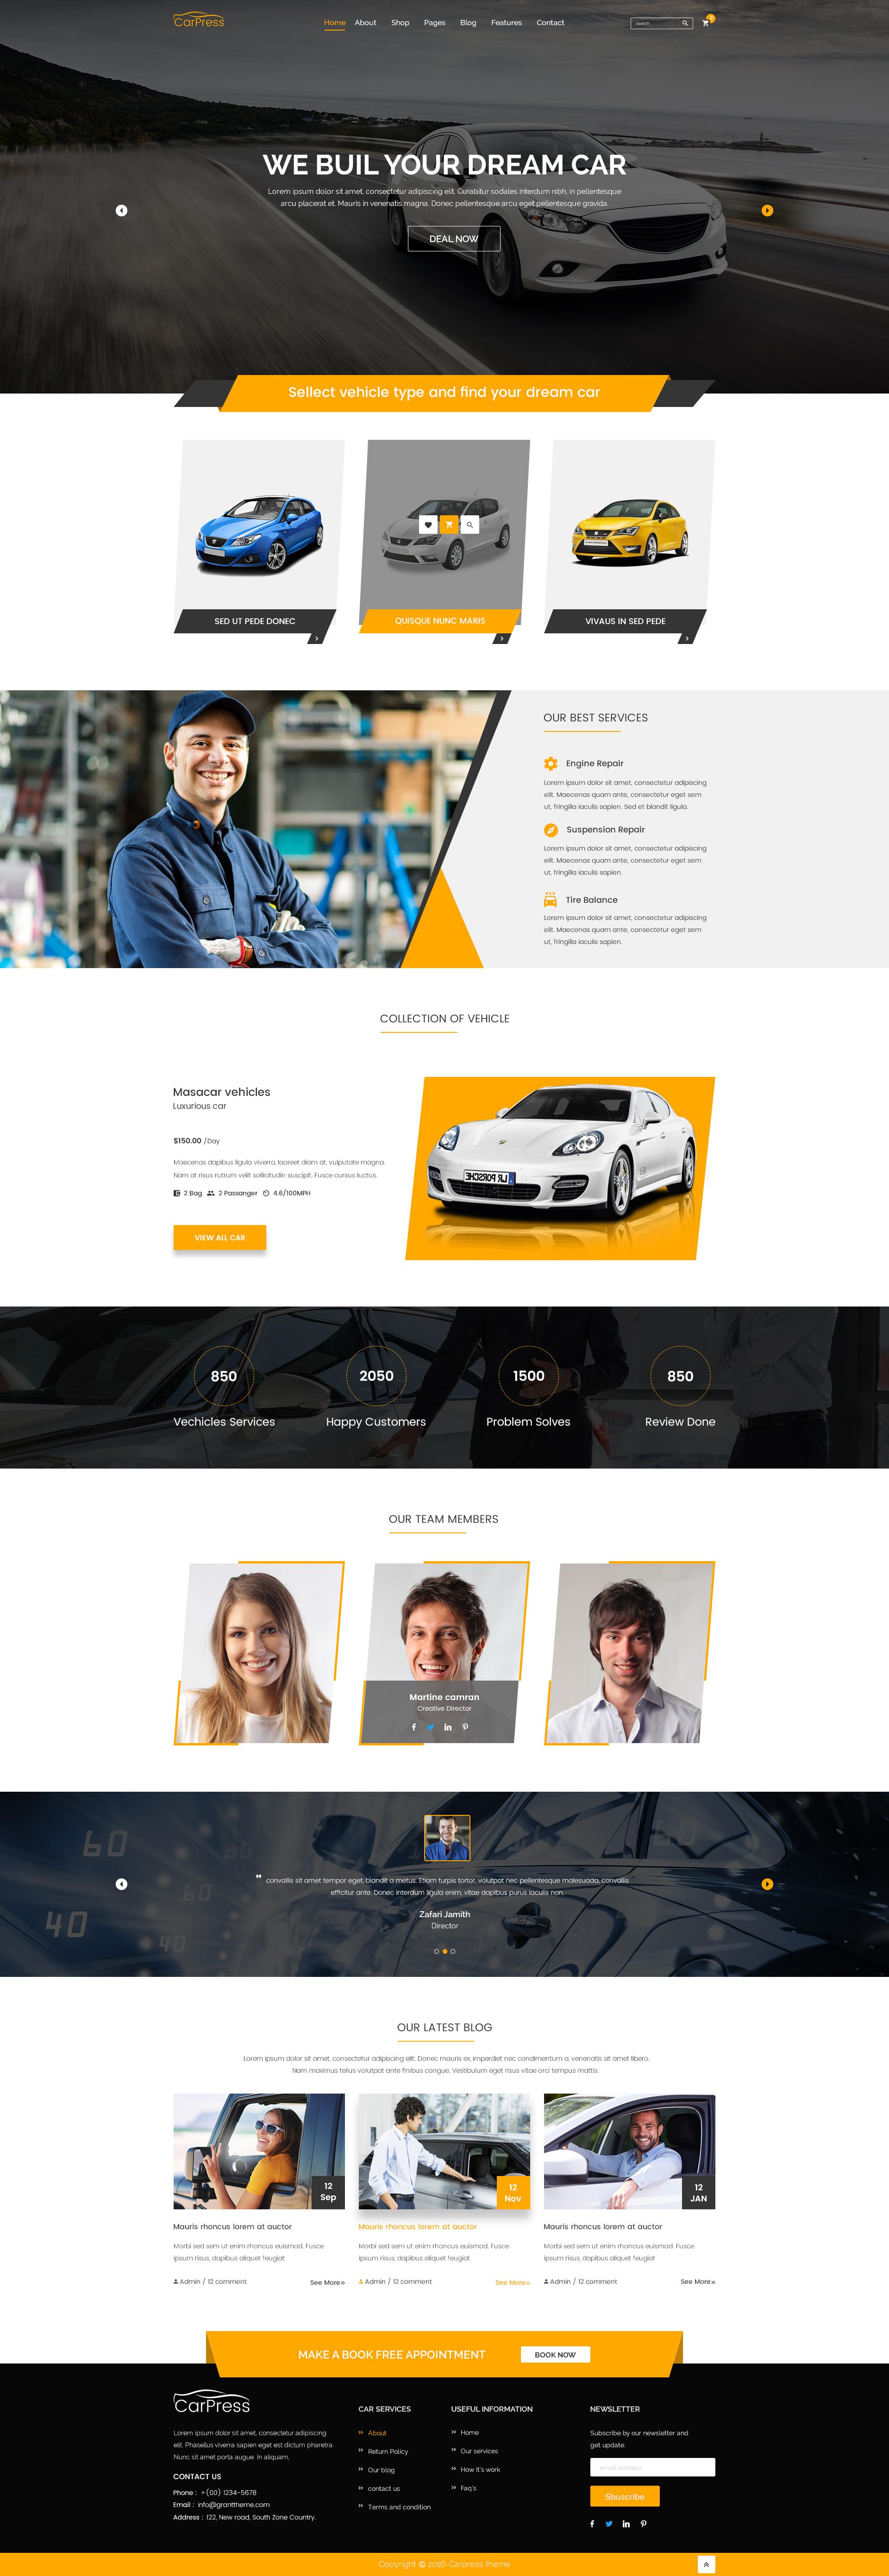 Carpress For Car Shop And Car Repiar Html5 Template By Radontheme